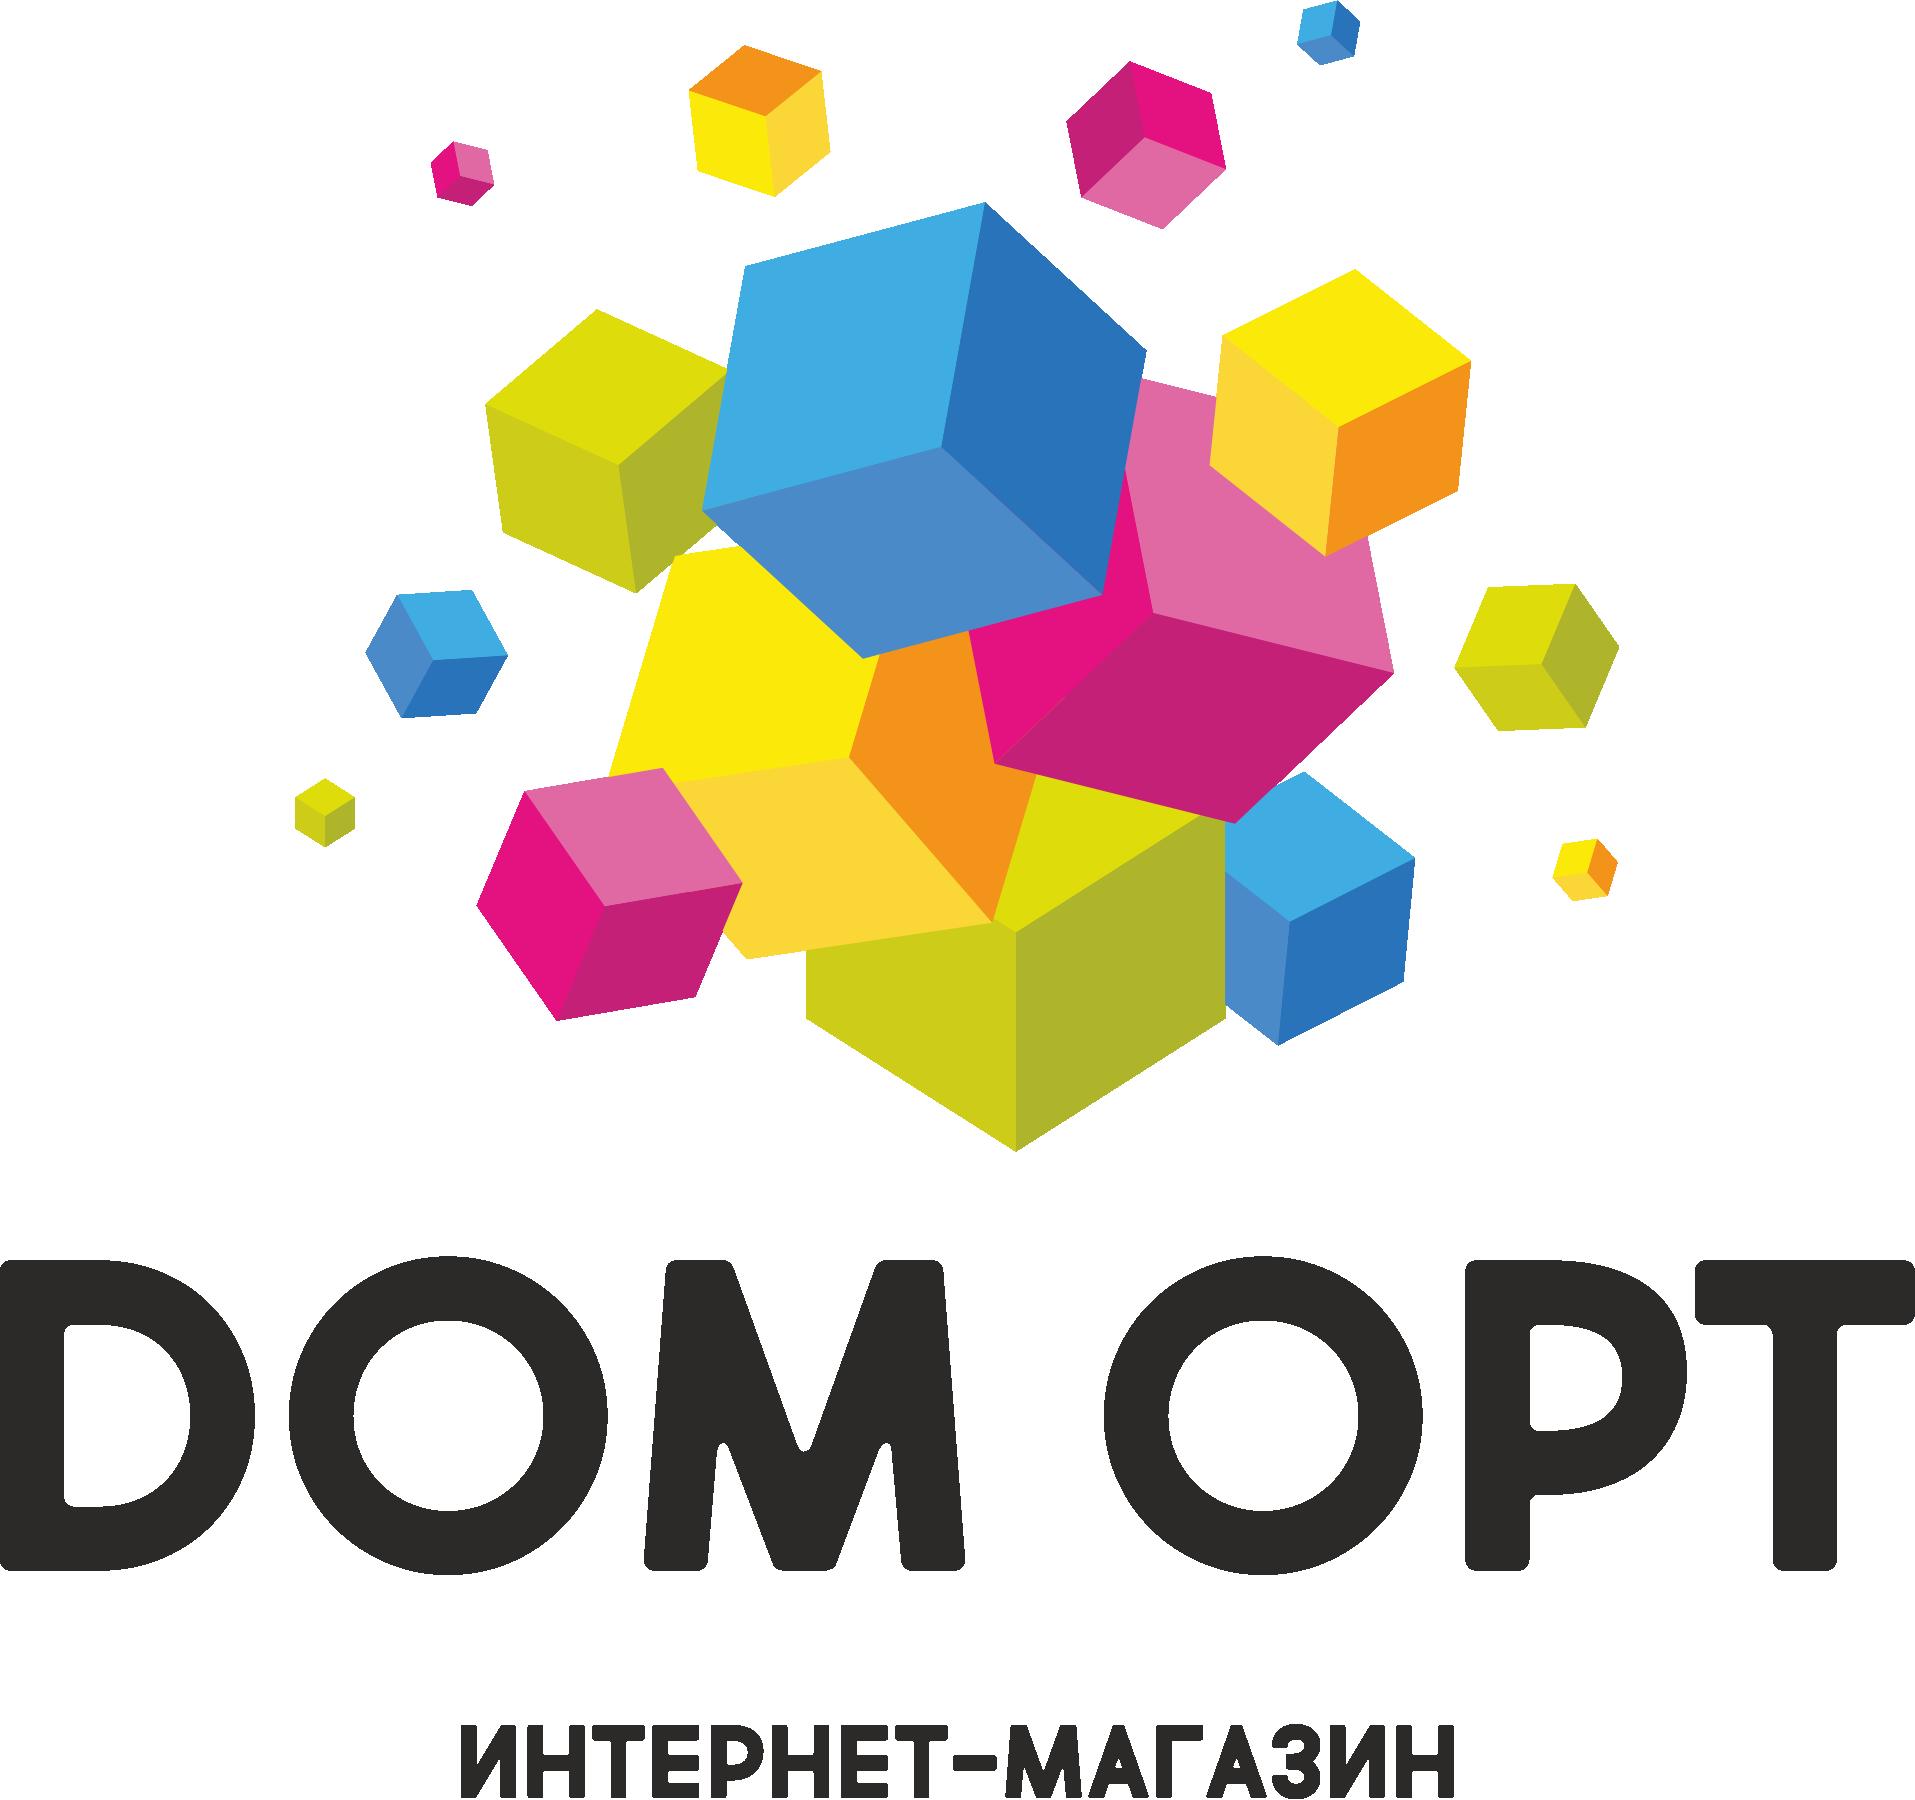 Дом Опт - трикотаж и косметика в Новосибирске